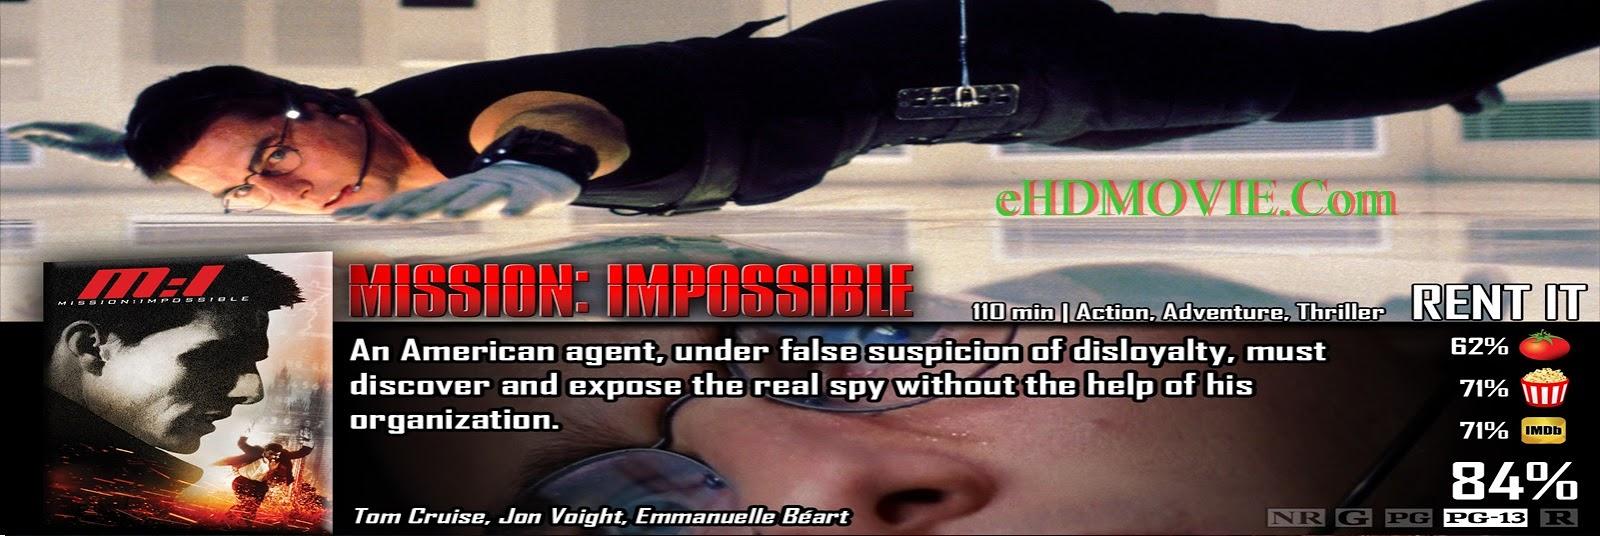 Mission: Impossible 1996 Full Movie Dual Audio [Hindi – English] 1080p - 720p - 480p ORG BRRip 300MB - 800MB - 2GB ESubs Free Download